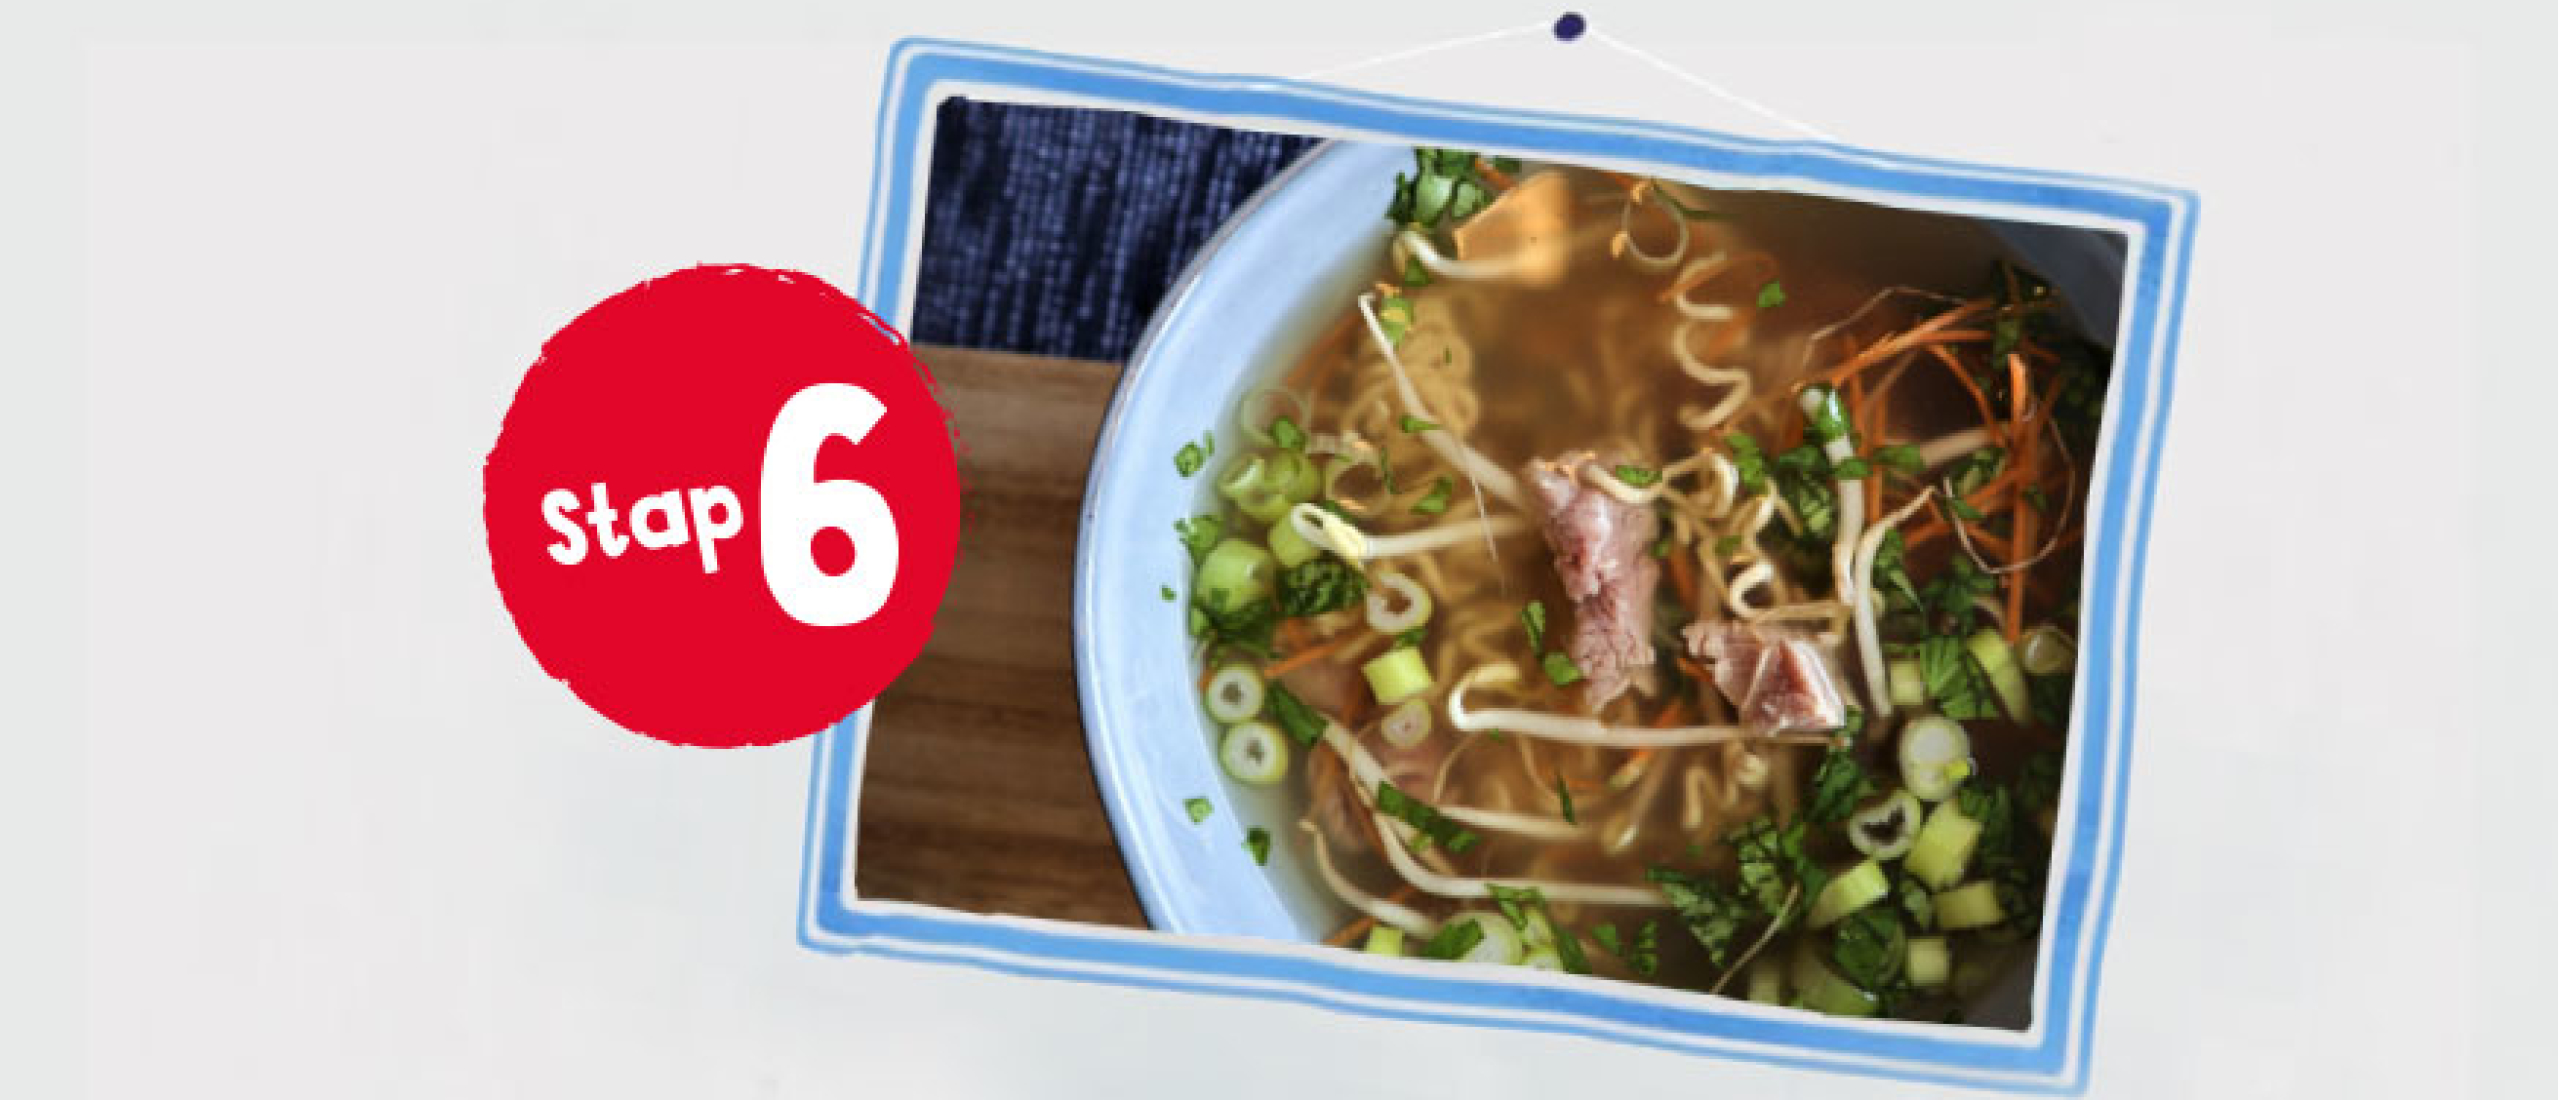 Vietnamese noedelsoep recept vanaf stap 6